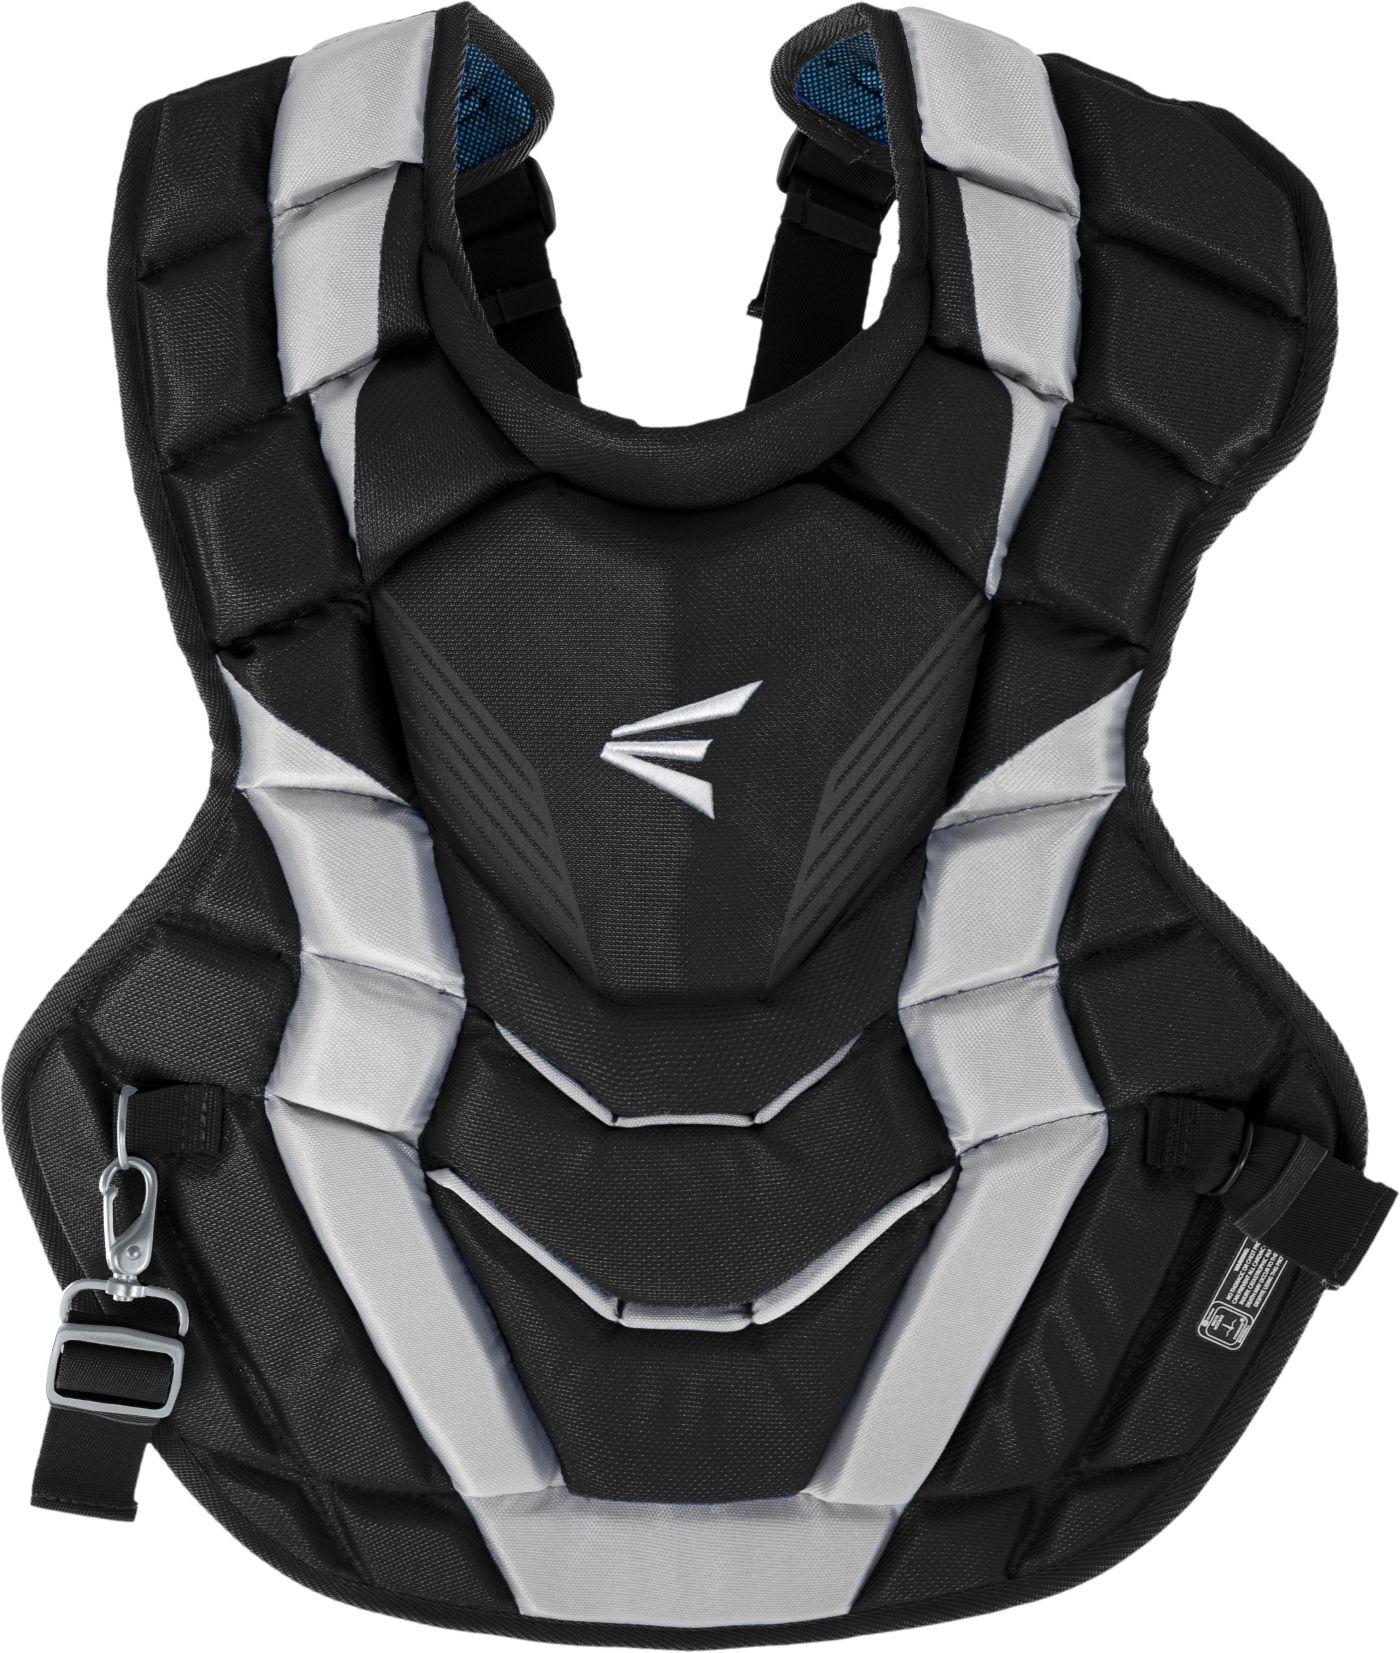 Easton Adult 17.5'' Gametime Elite Chest Protector